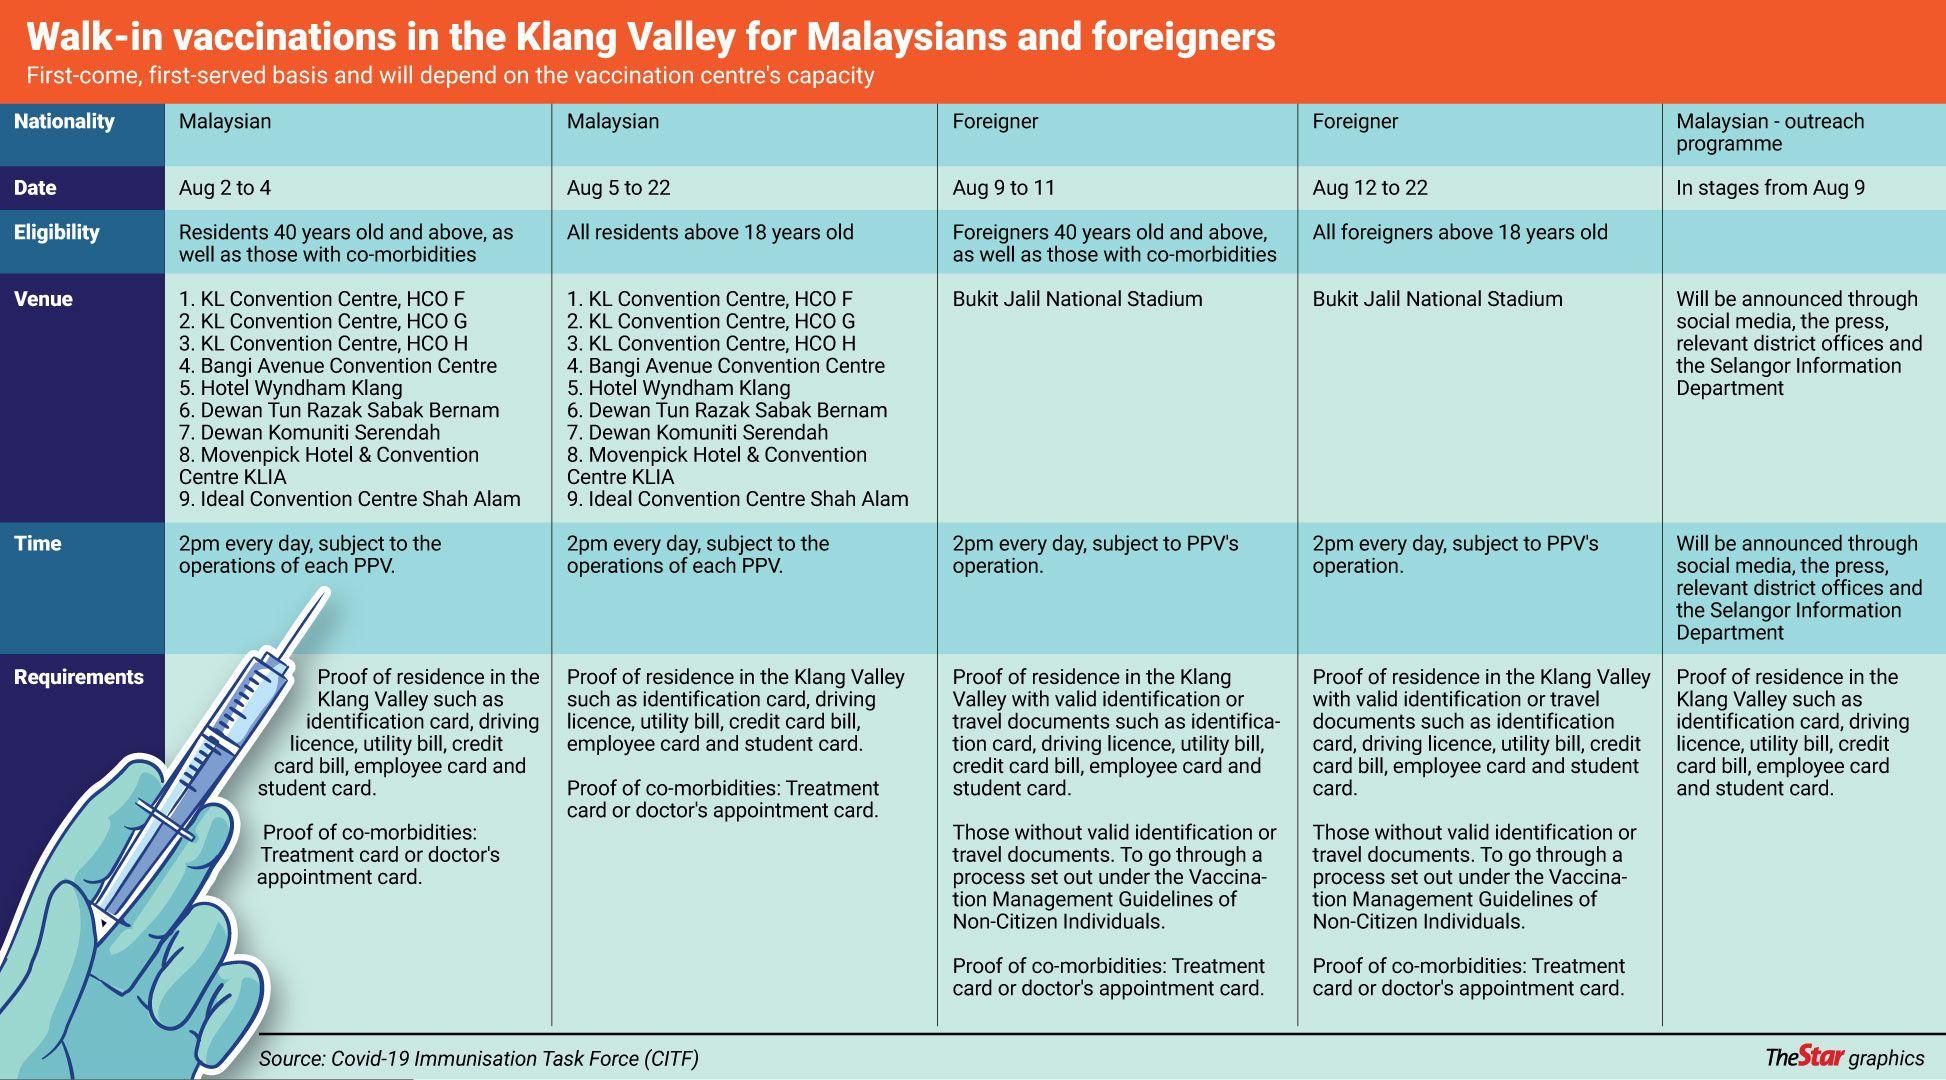 Walk-in vaccinations in Klang Valley